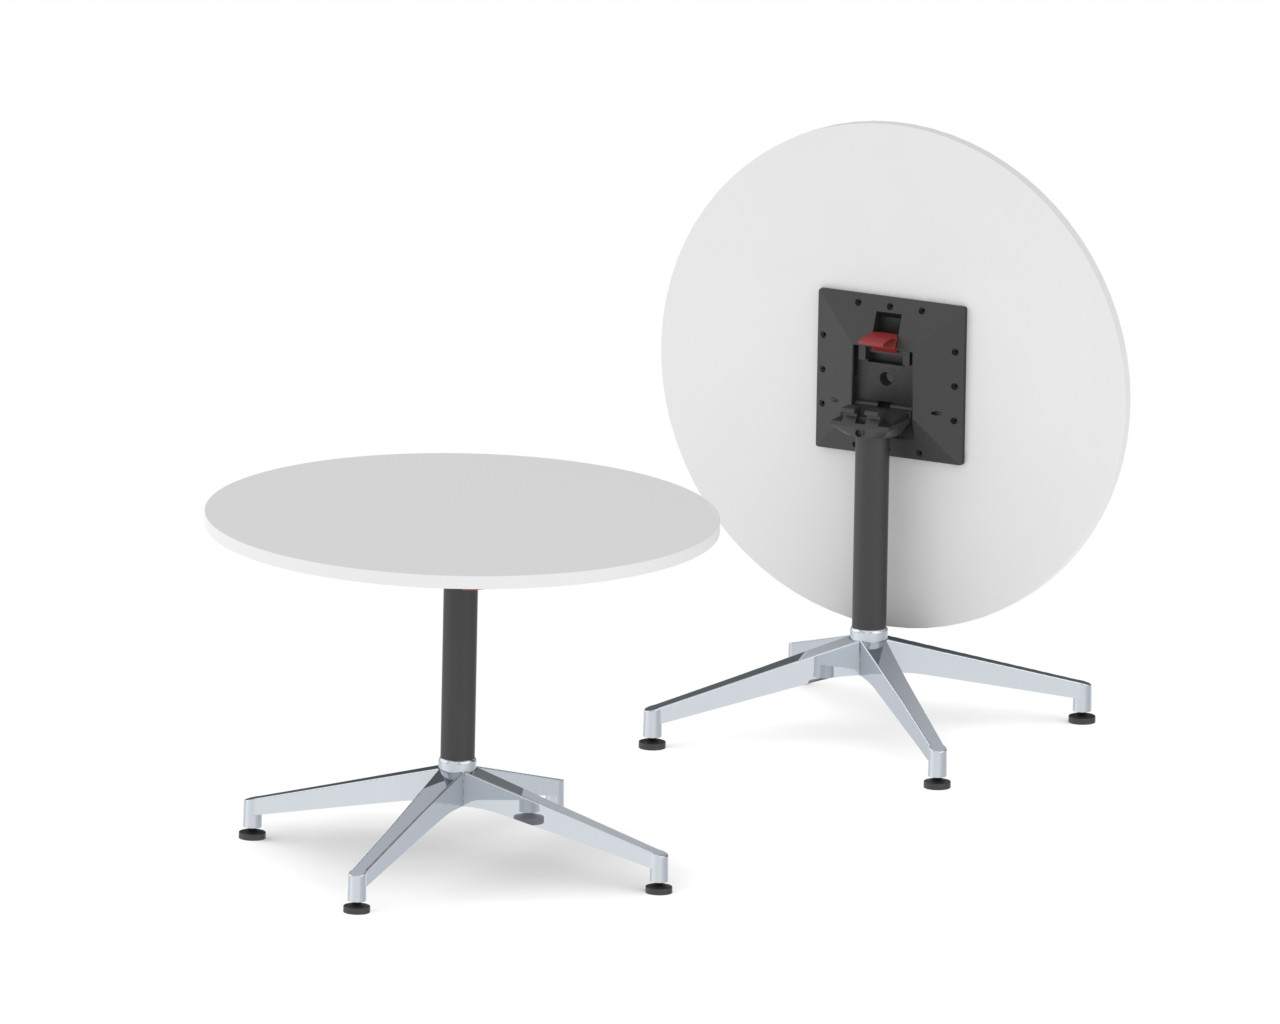 CN-1025.002  U.R. -4 Star - Folding Table - 300 x 300mm Adaptor - Glides - Black Texture - Complete.JPG